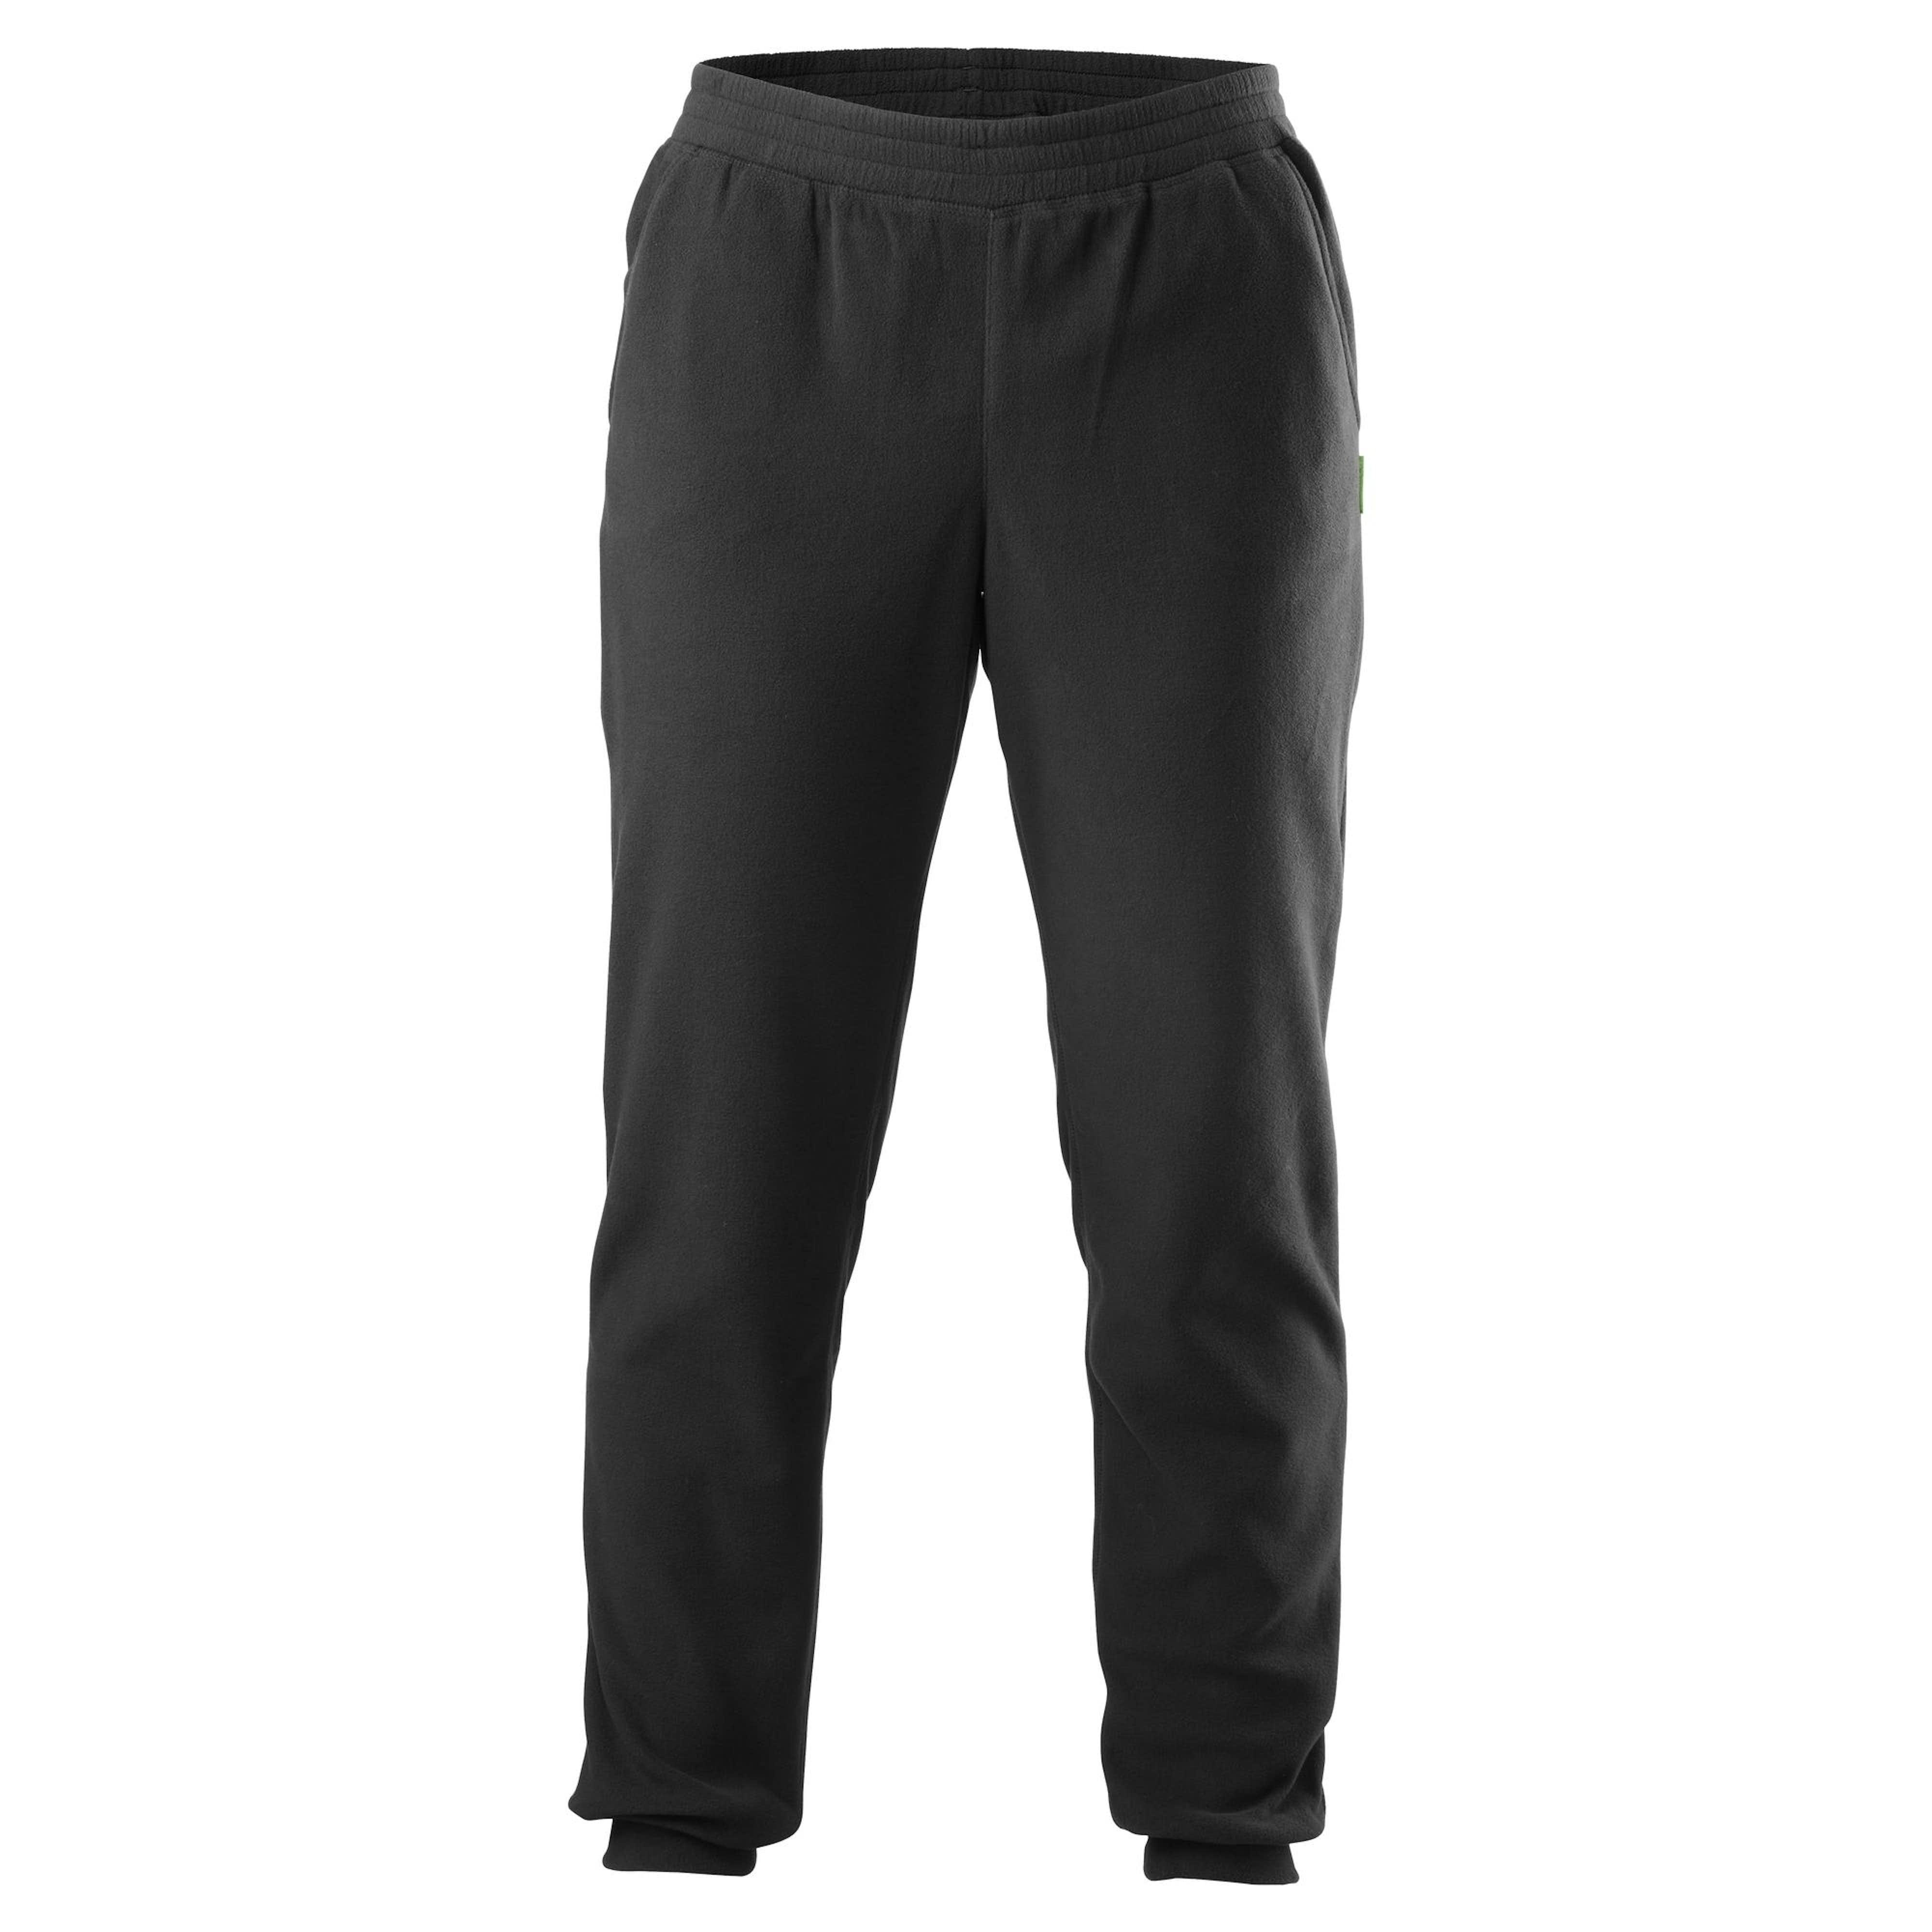 Womens Hiking Pants   Shorts  89ed6efc59